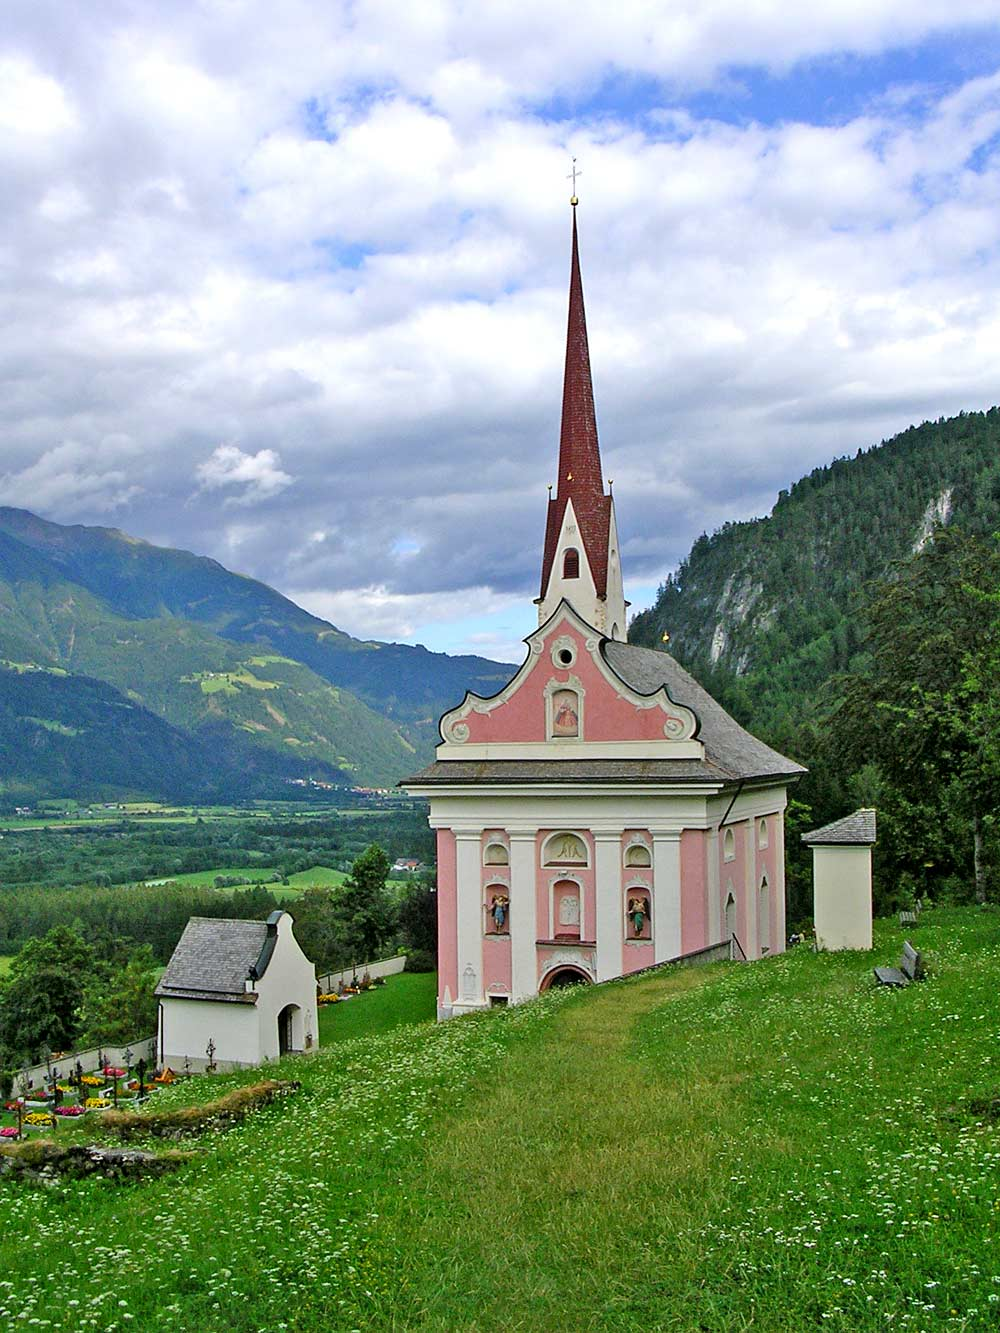 St. Ulrich auf dem Lavanter Kirchbichl